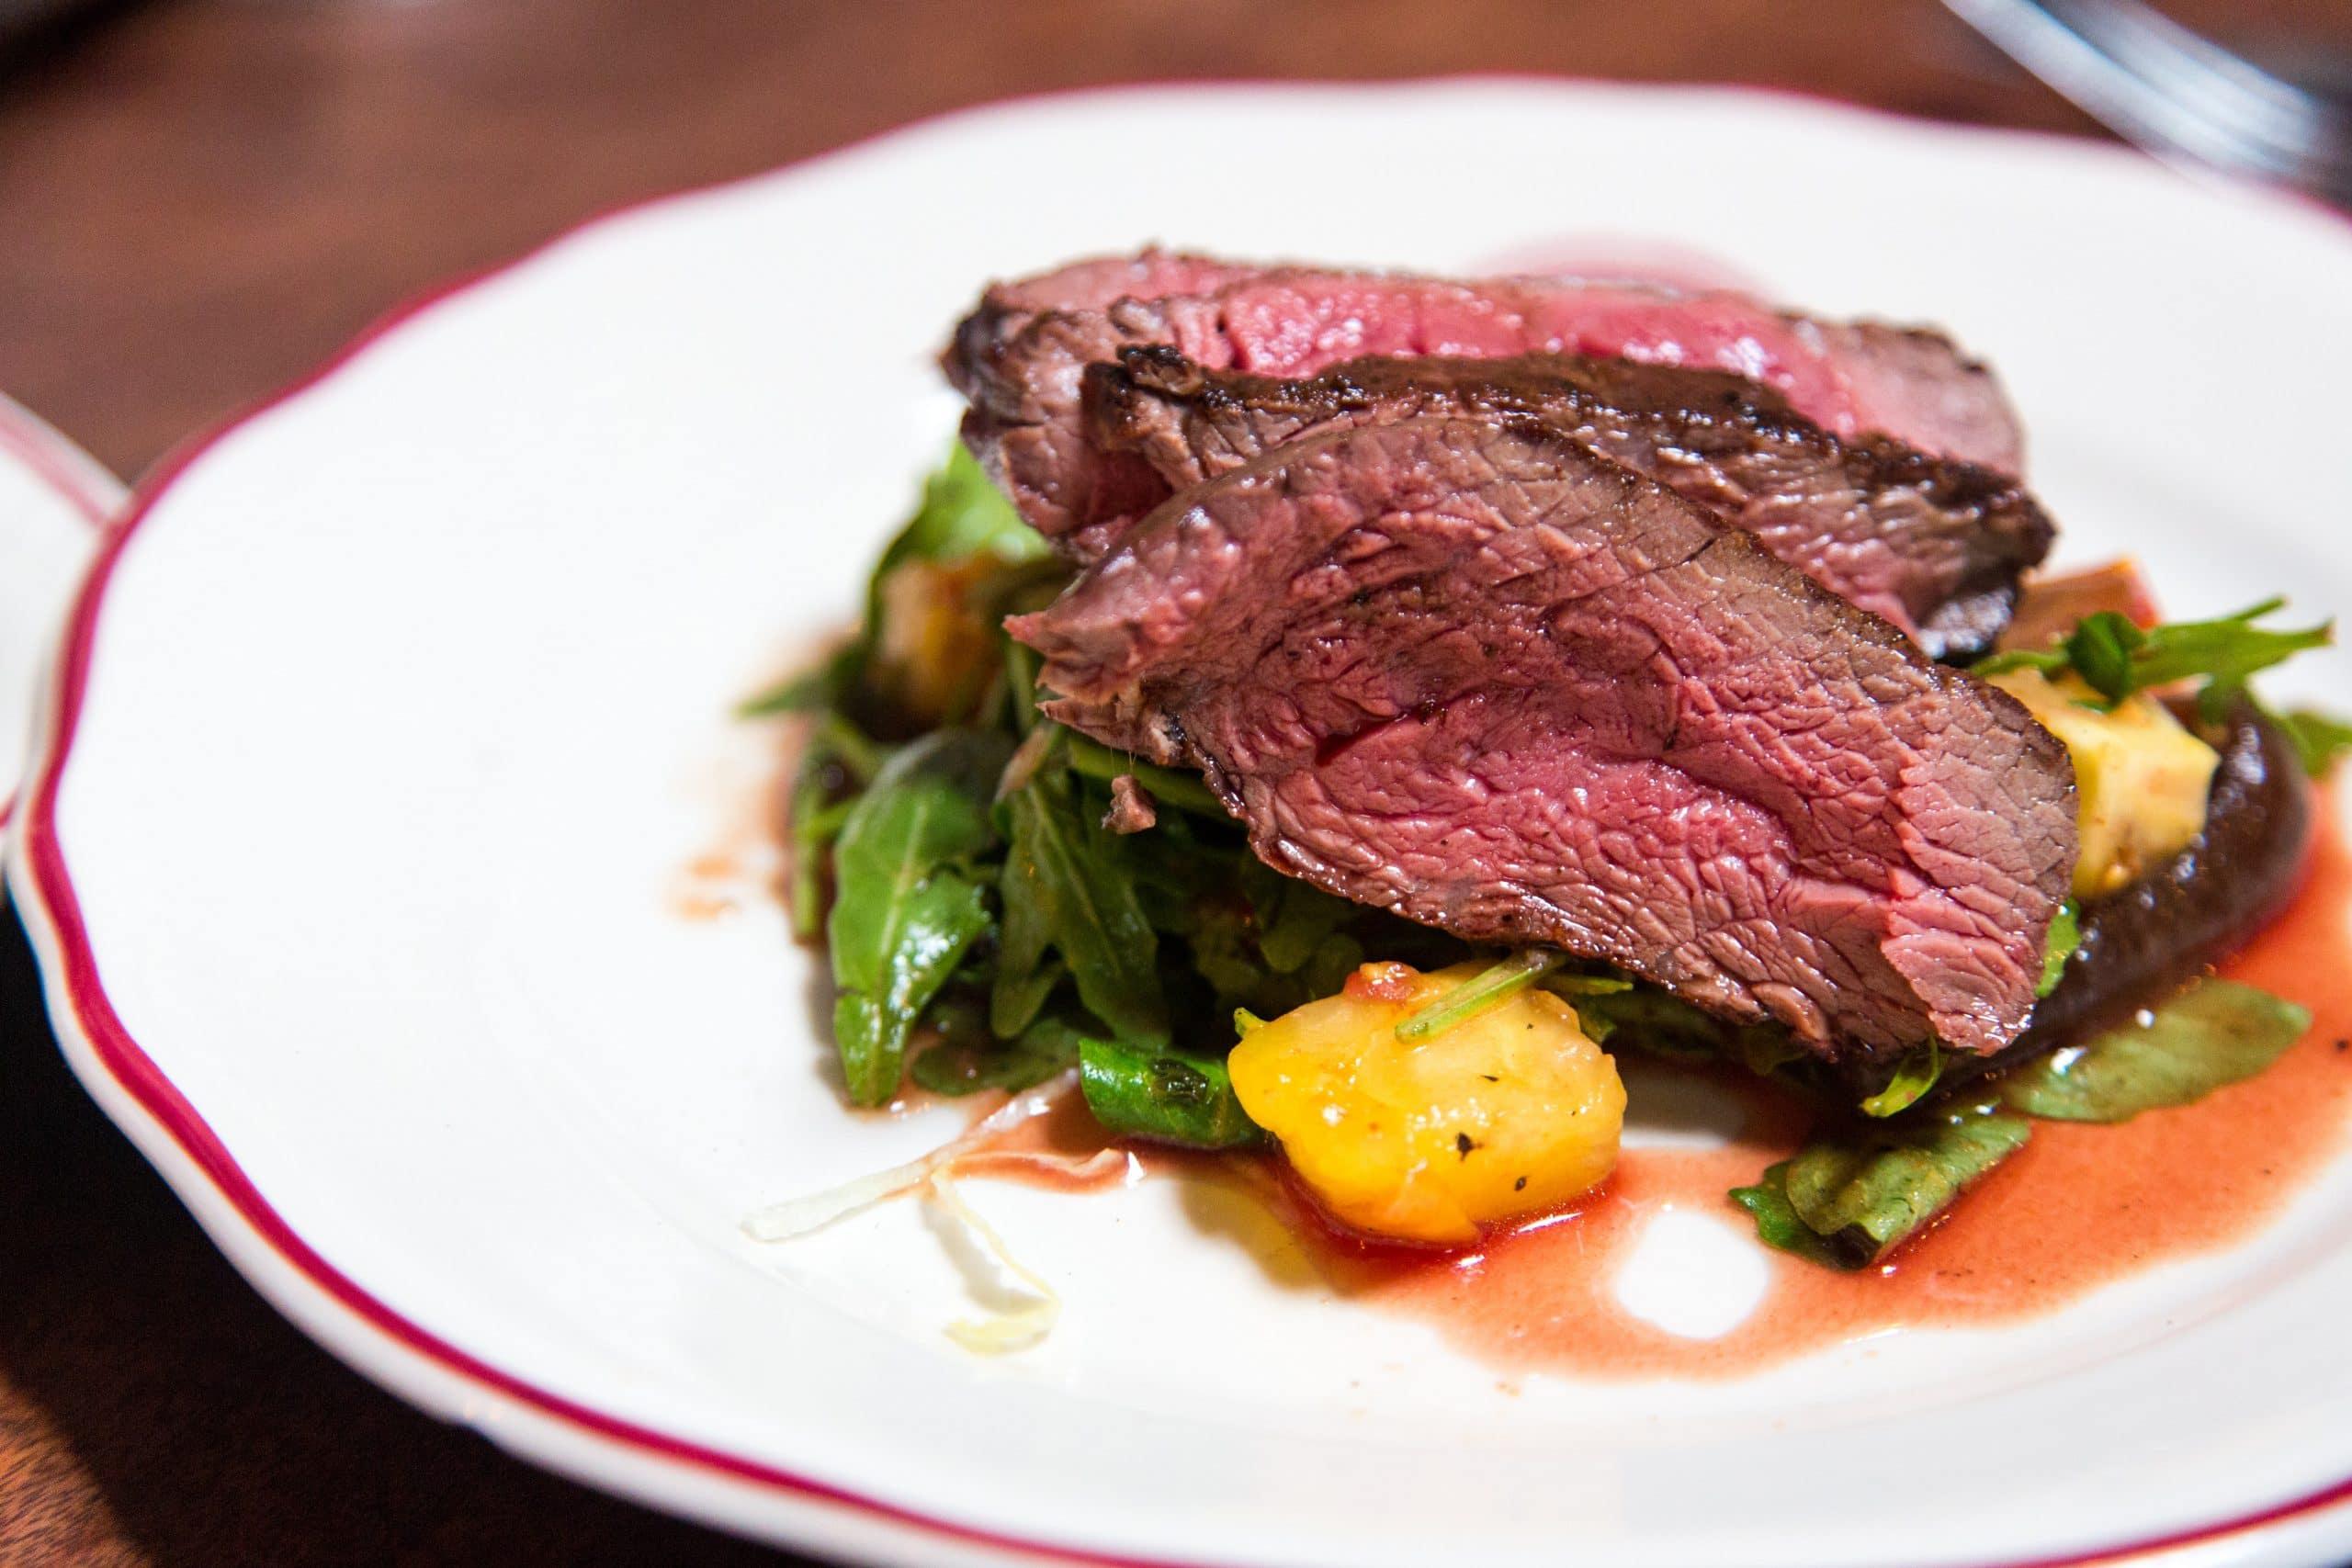 ground beef in fridge